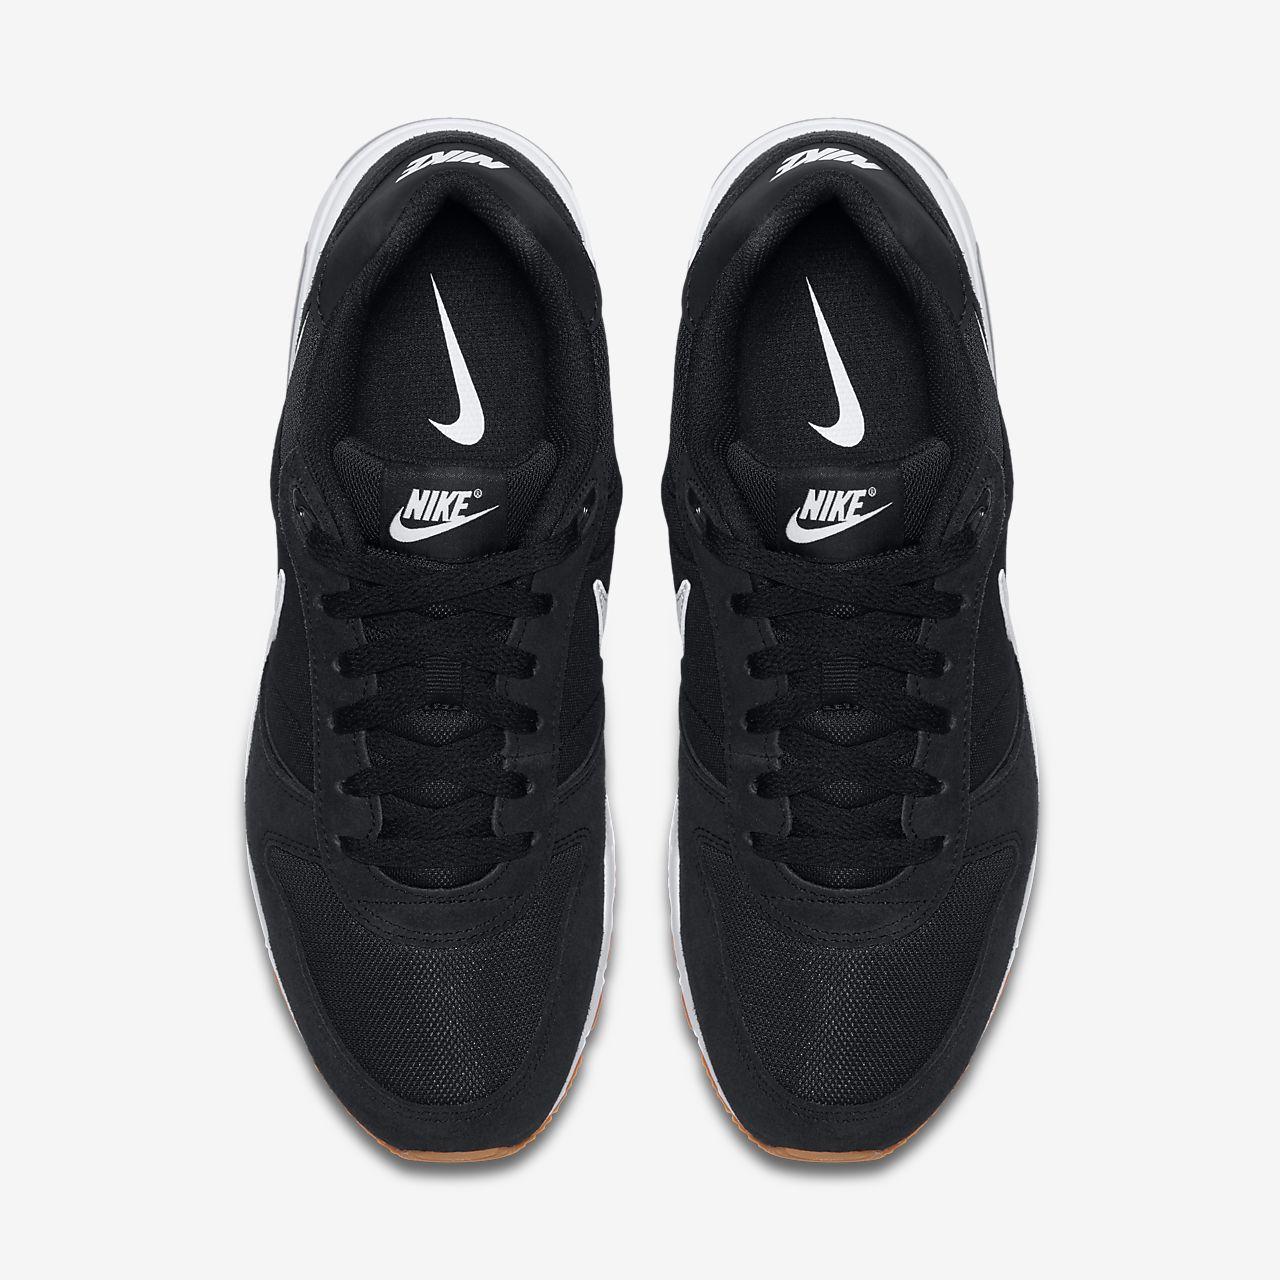 Low Resolution Nike Nightgazer Men's Shoe Nike Nightgazer Men's Shoe